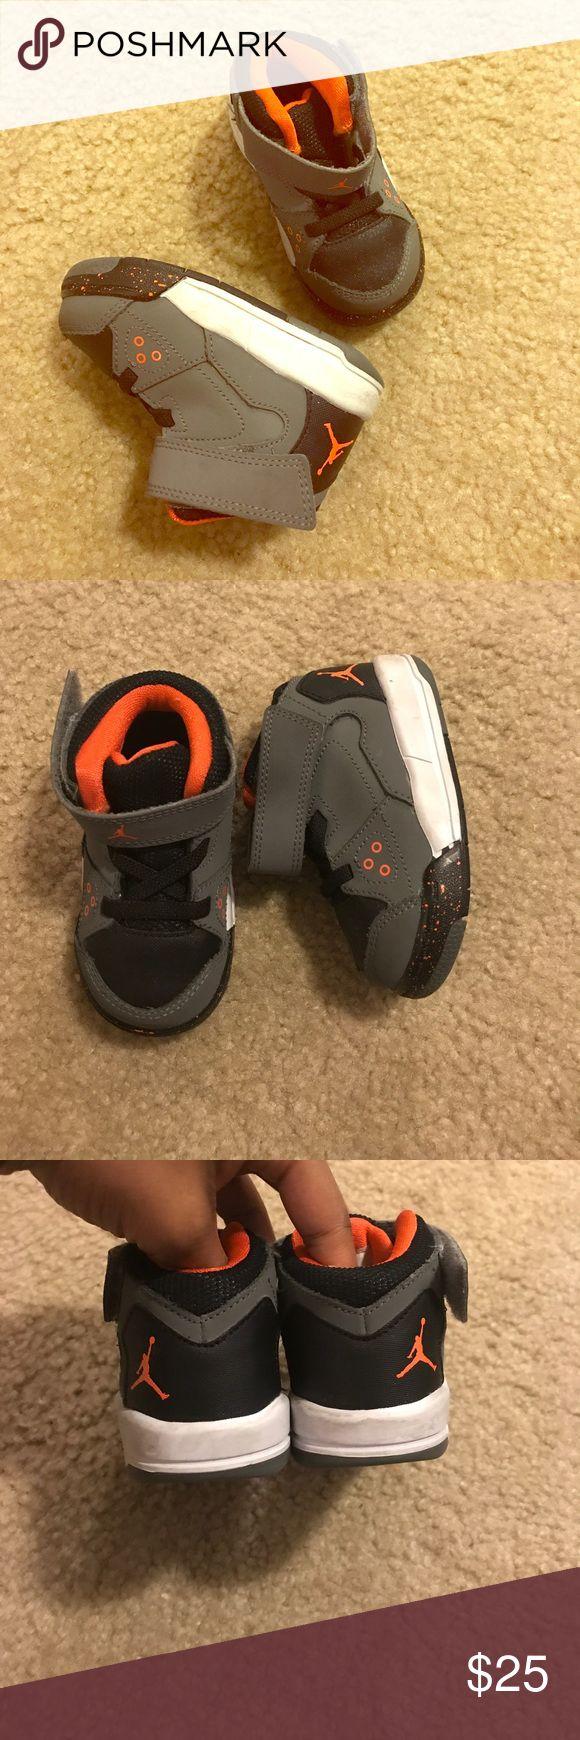 Kids baby walker Michael jordans sneakers size 5 c Kids baby walker Michael jordans (Nike air Jordan) sneakers size 5c. They are gray orange black and white. Jordan Shoes Baby & Walker